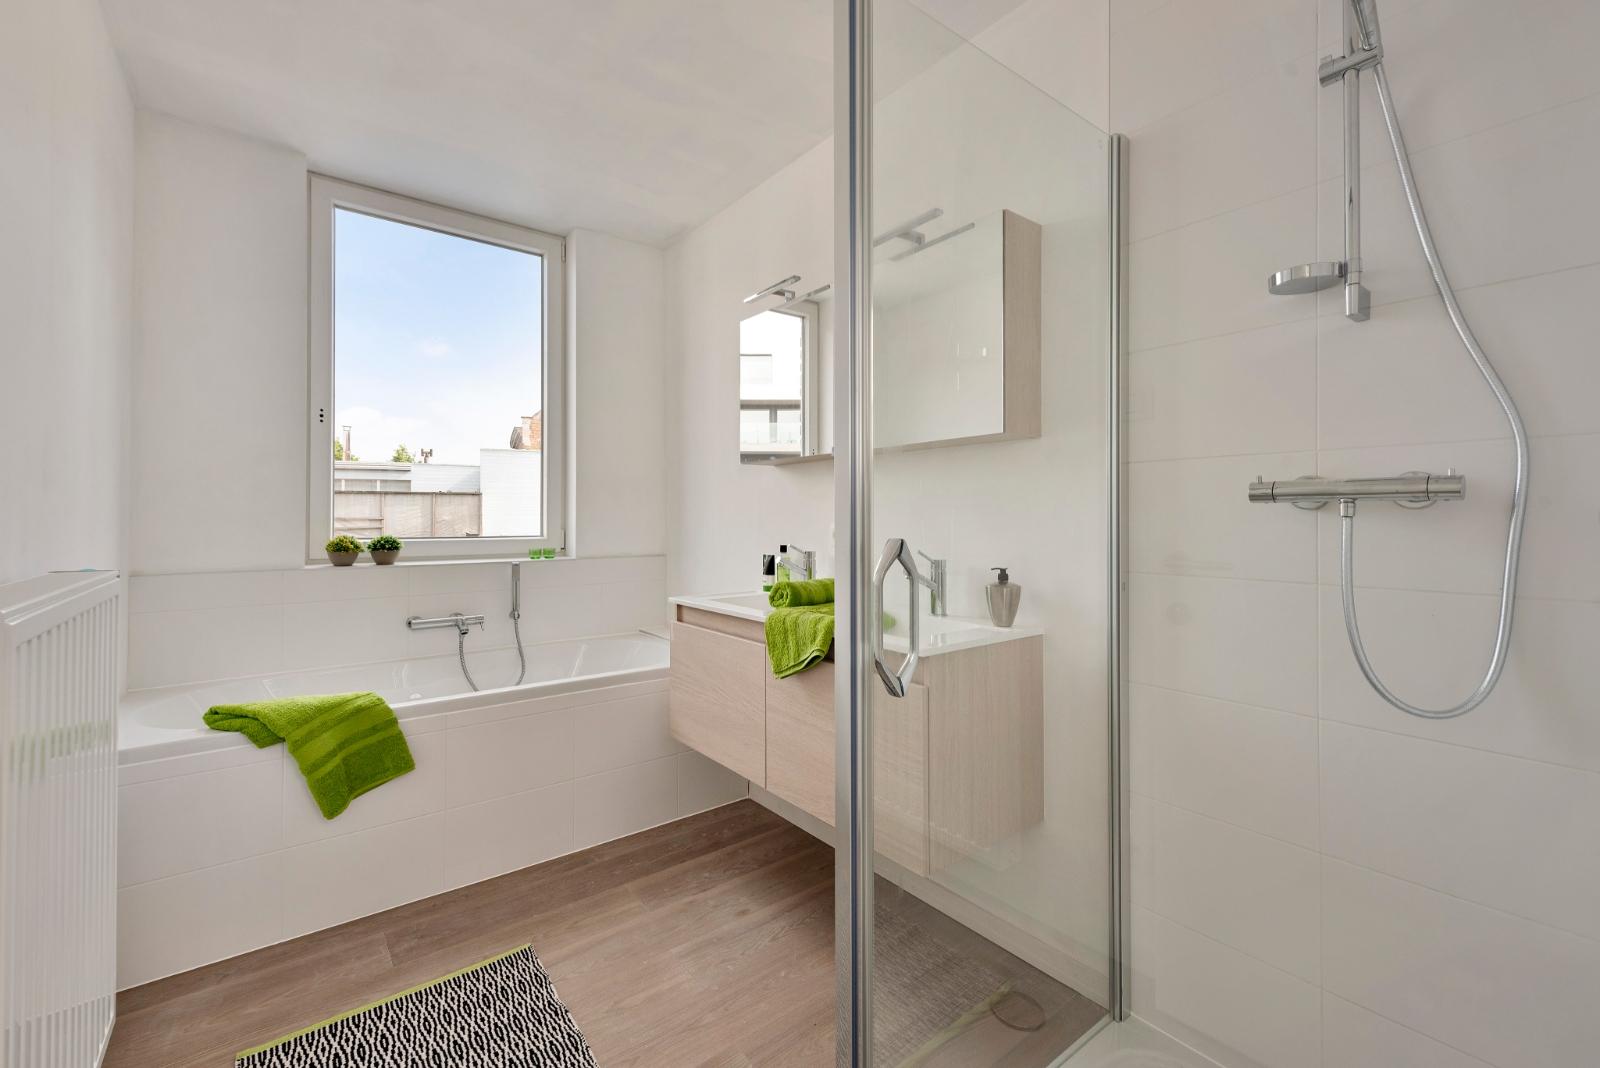 Prachtig appartement met super ruim terras in centrum Diksmuide - 7